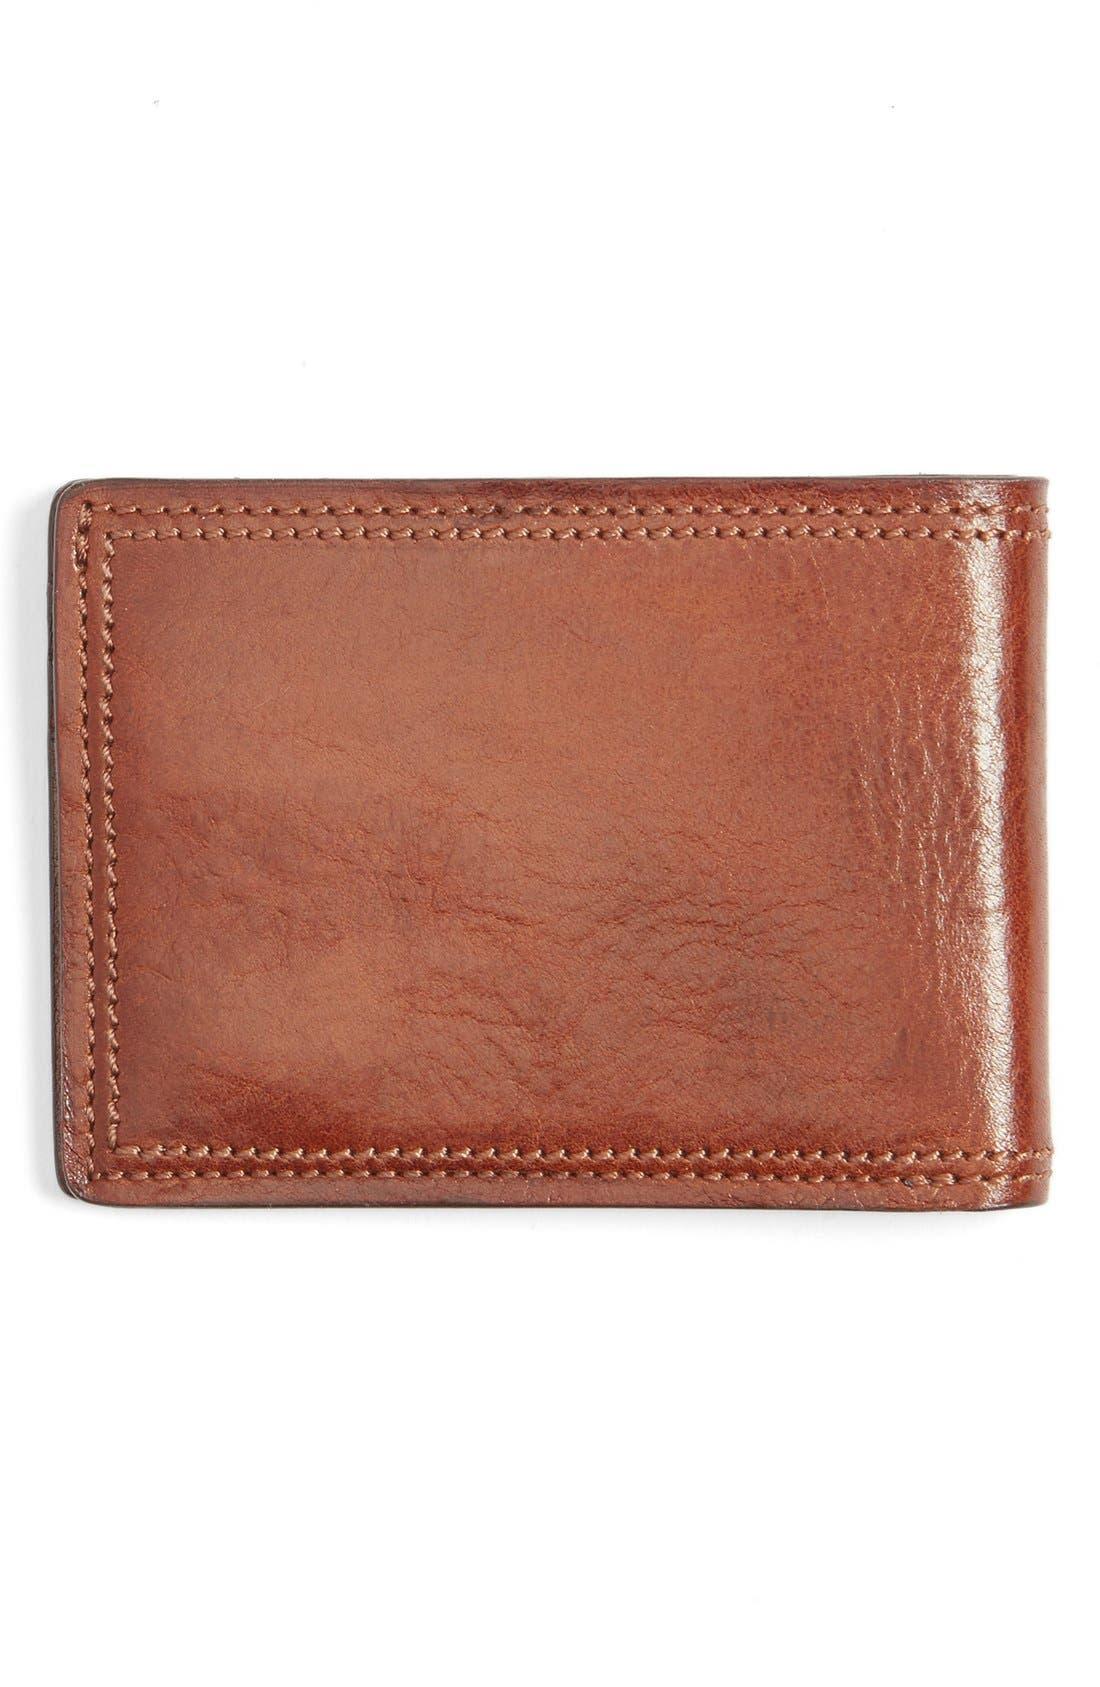 BOSCA,                             Leather Bifold Wallet,                             Alternate thumbnail 3, color,                             233